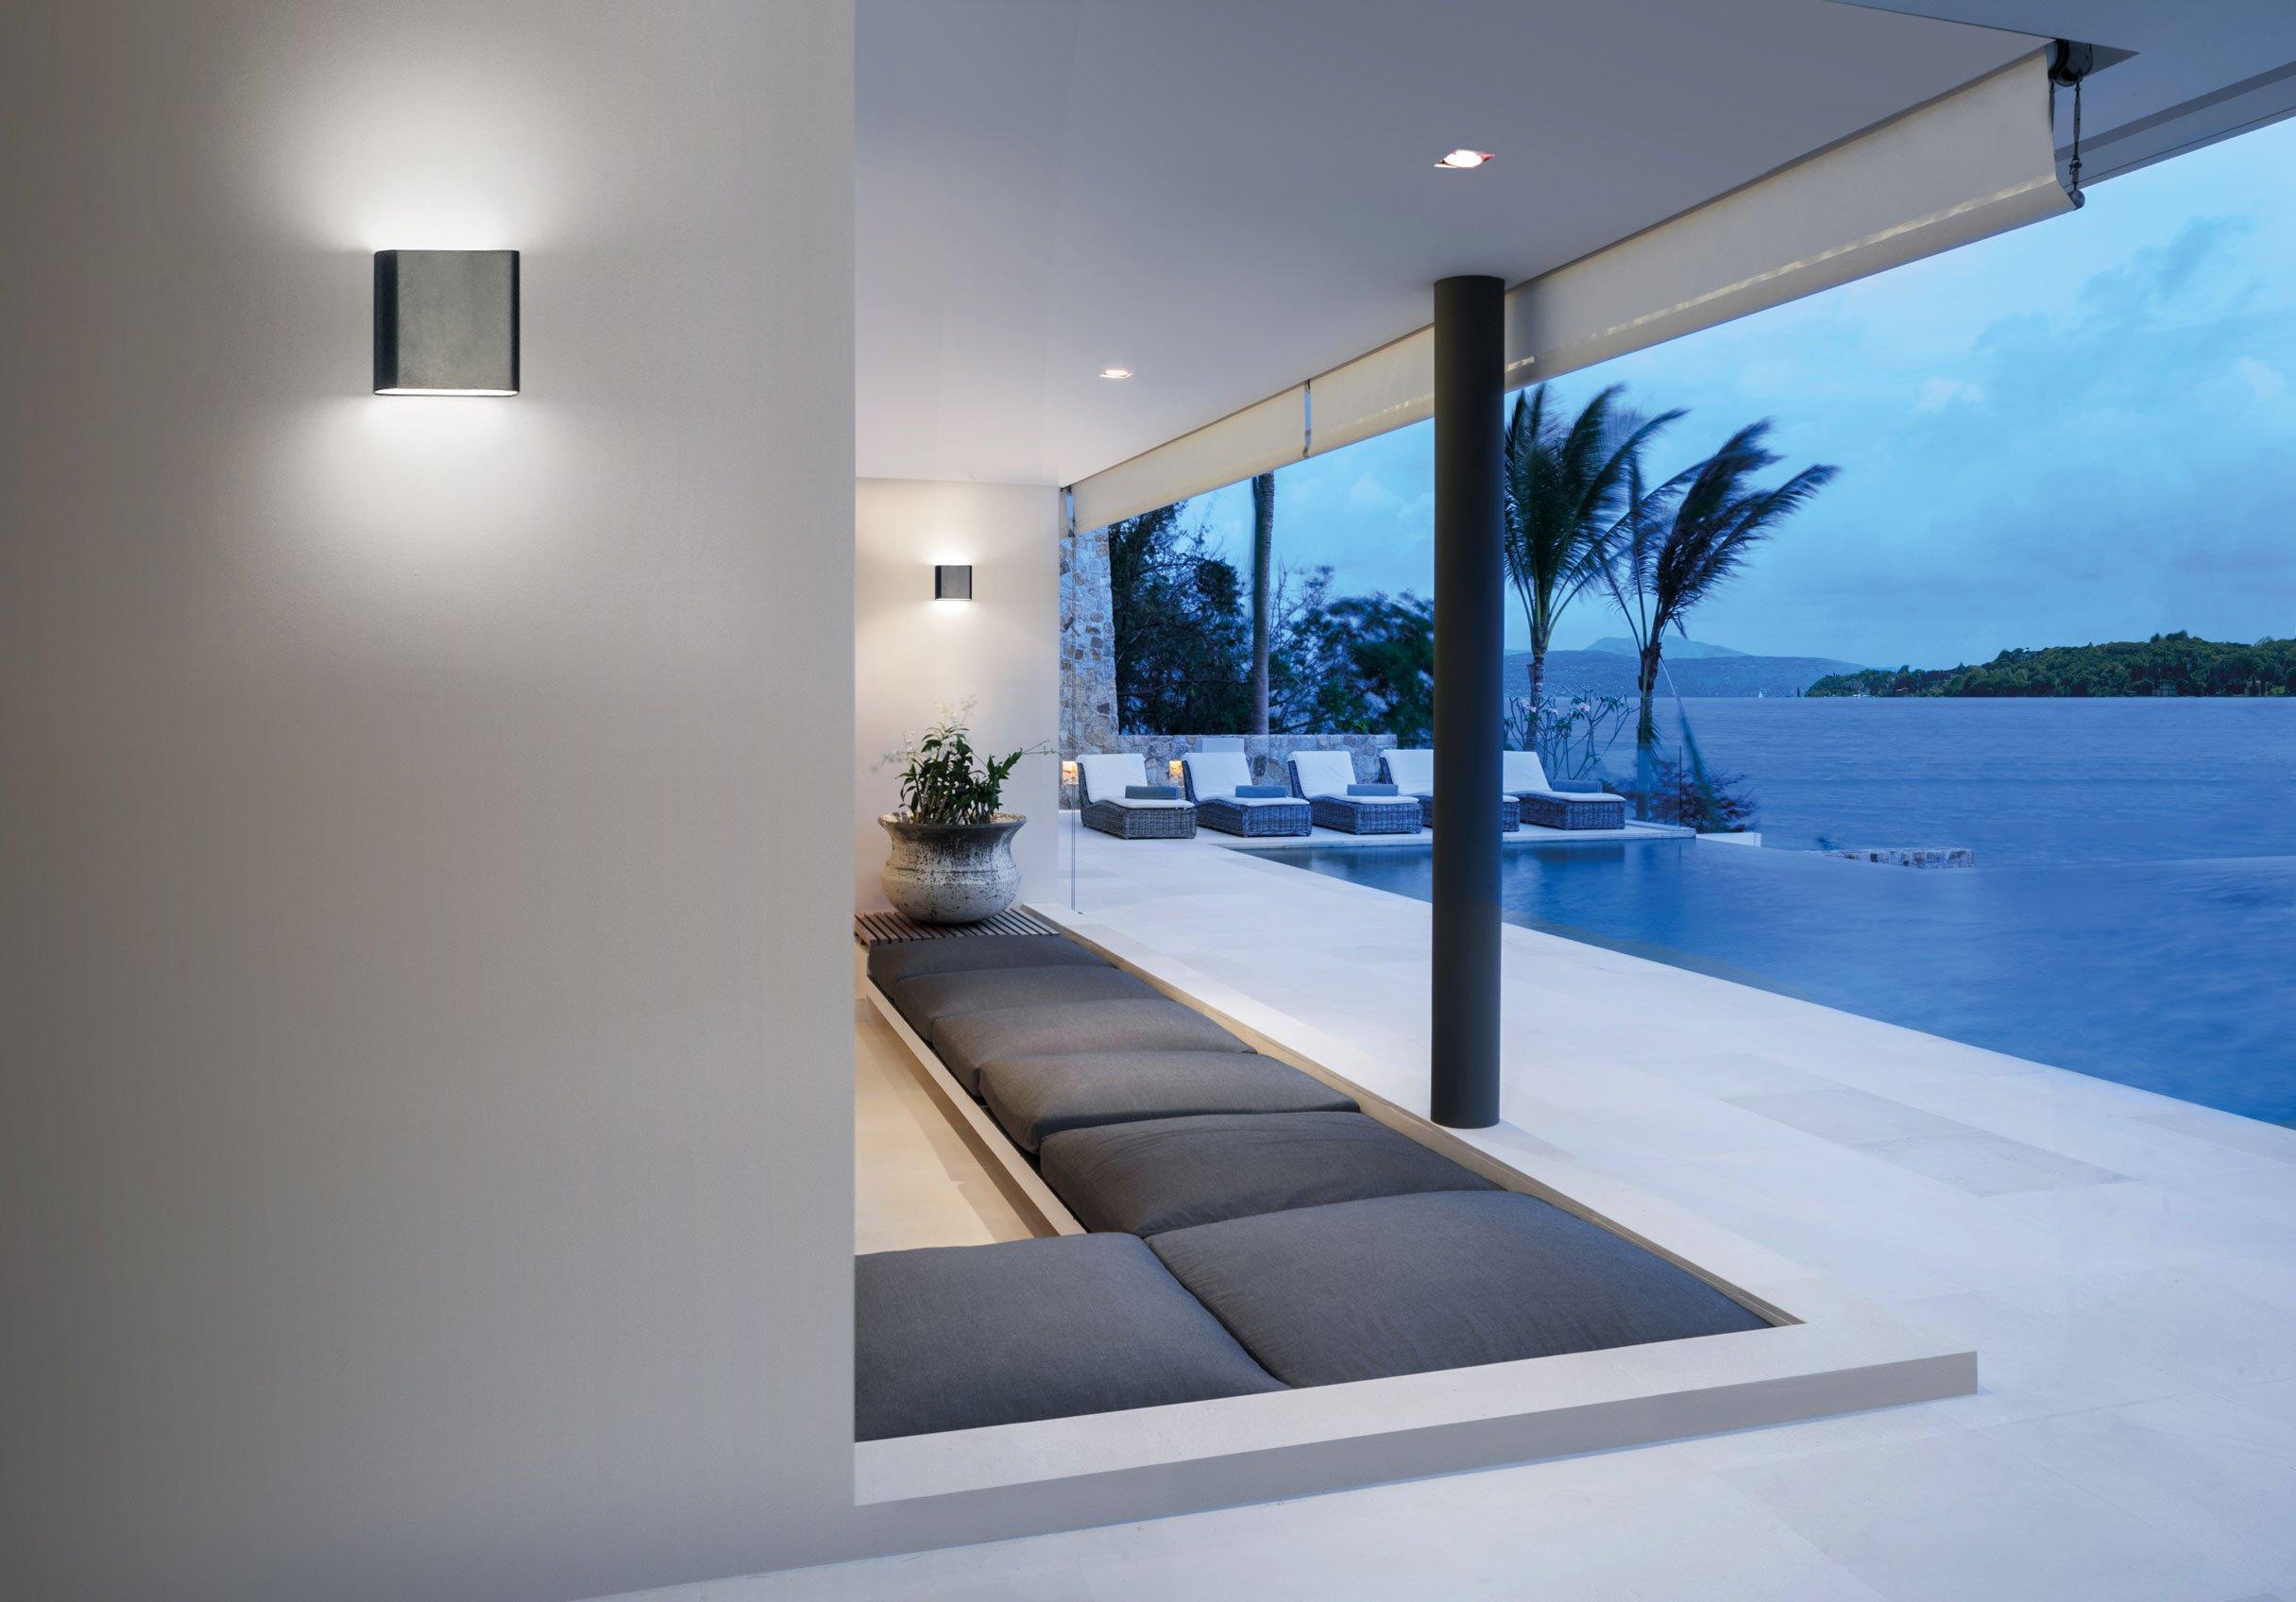 pocket-applique-parete-esterno-architettura